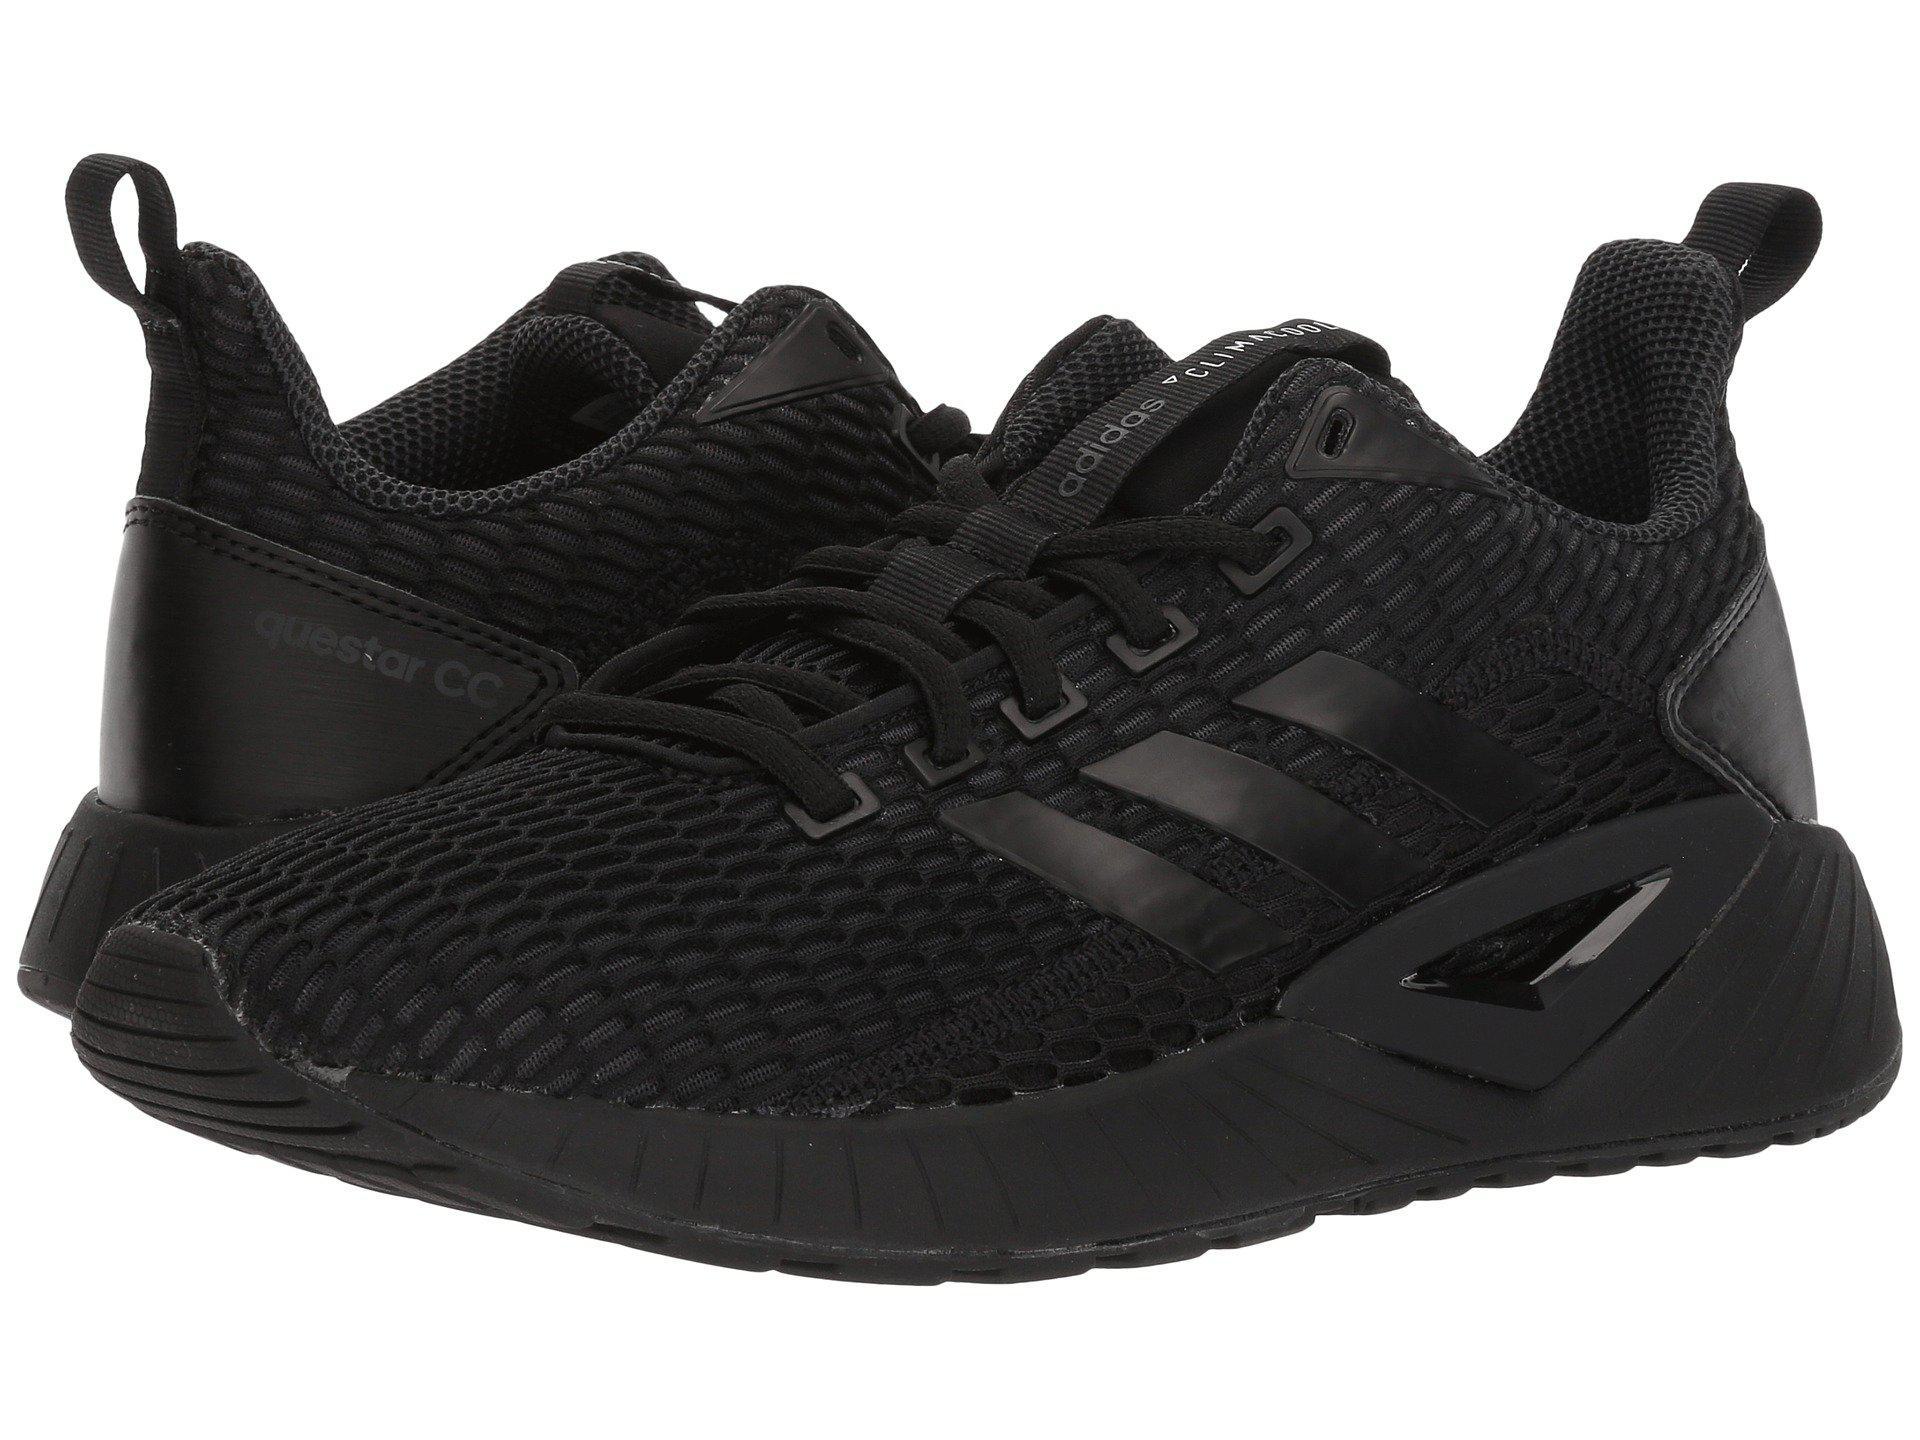 Adidas Men's Questar CC Running ... outlet cheap cheap sale authentic reliable cheap price cheap sale wholesale price vjAU6Yt